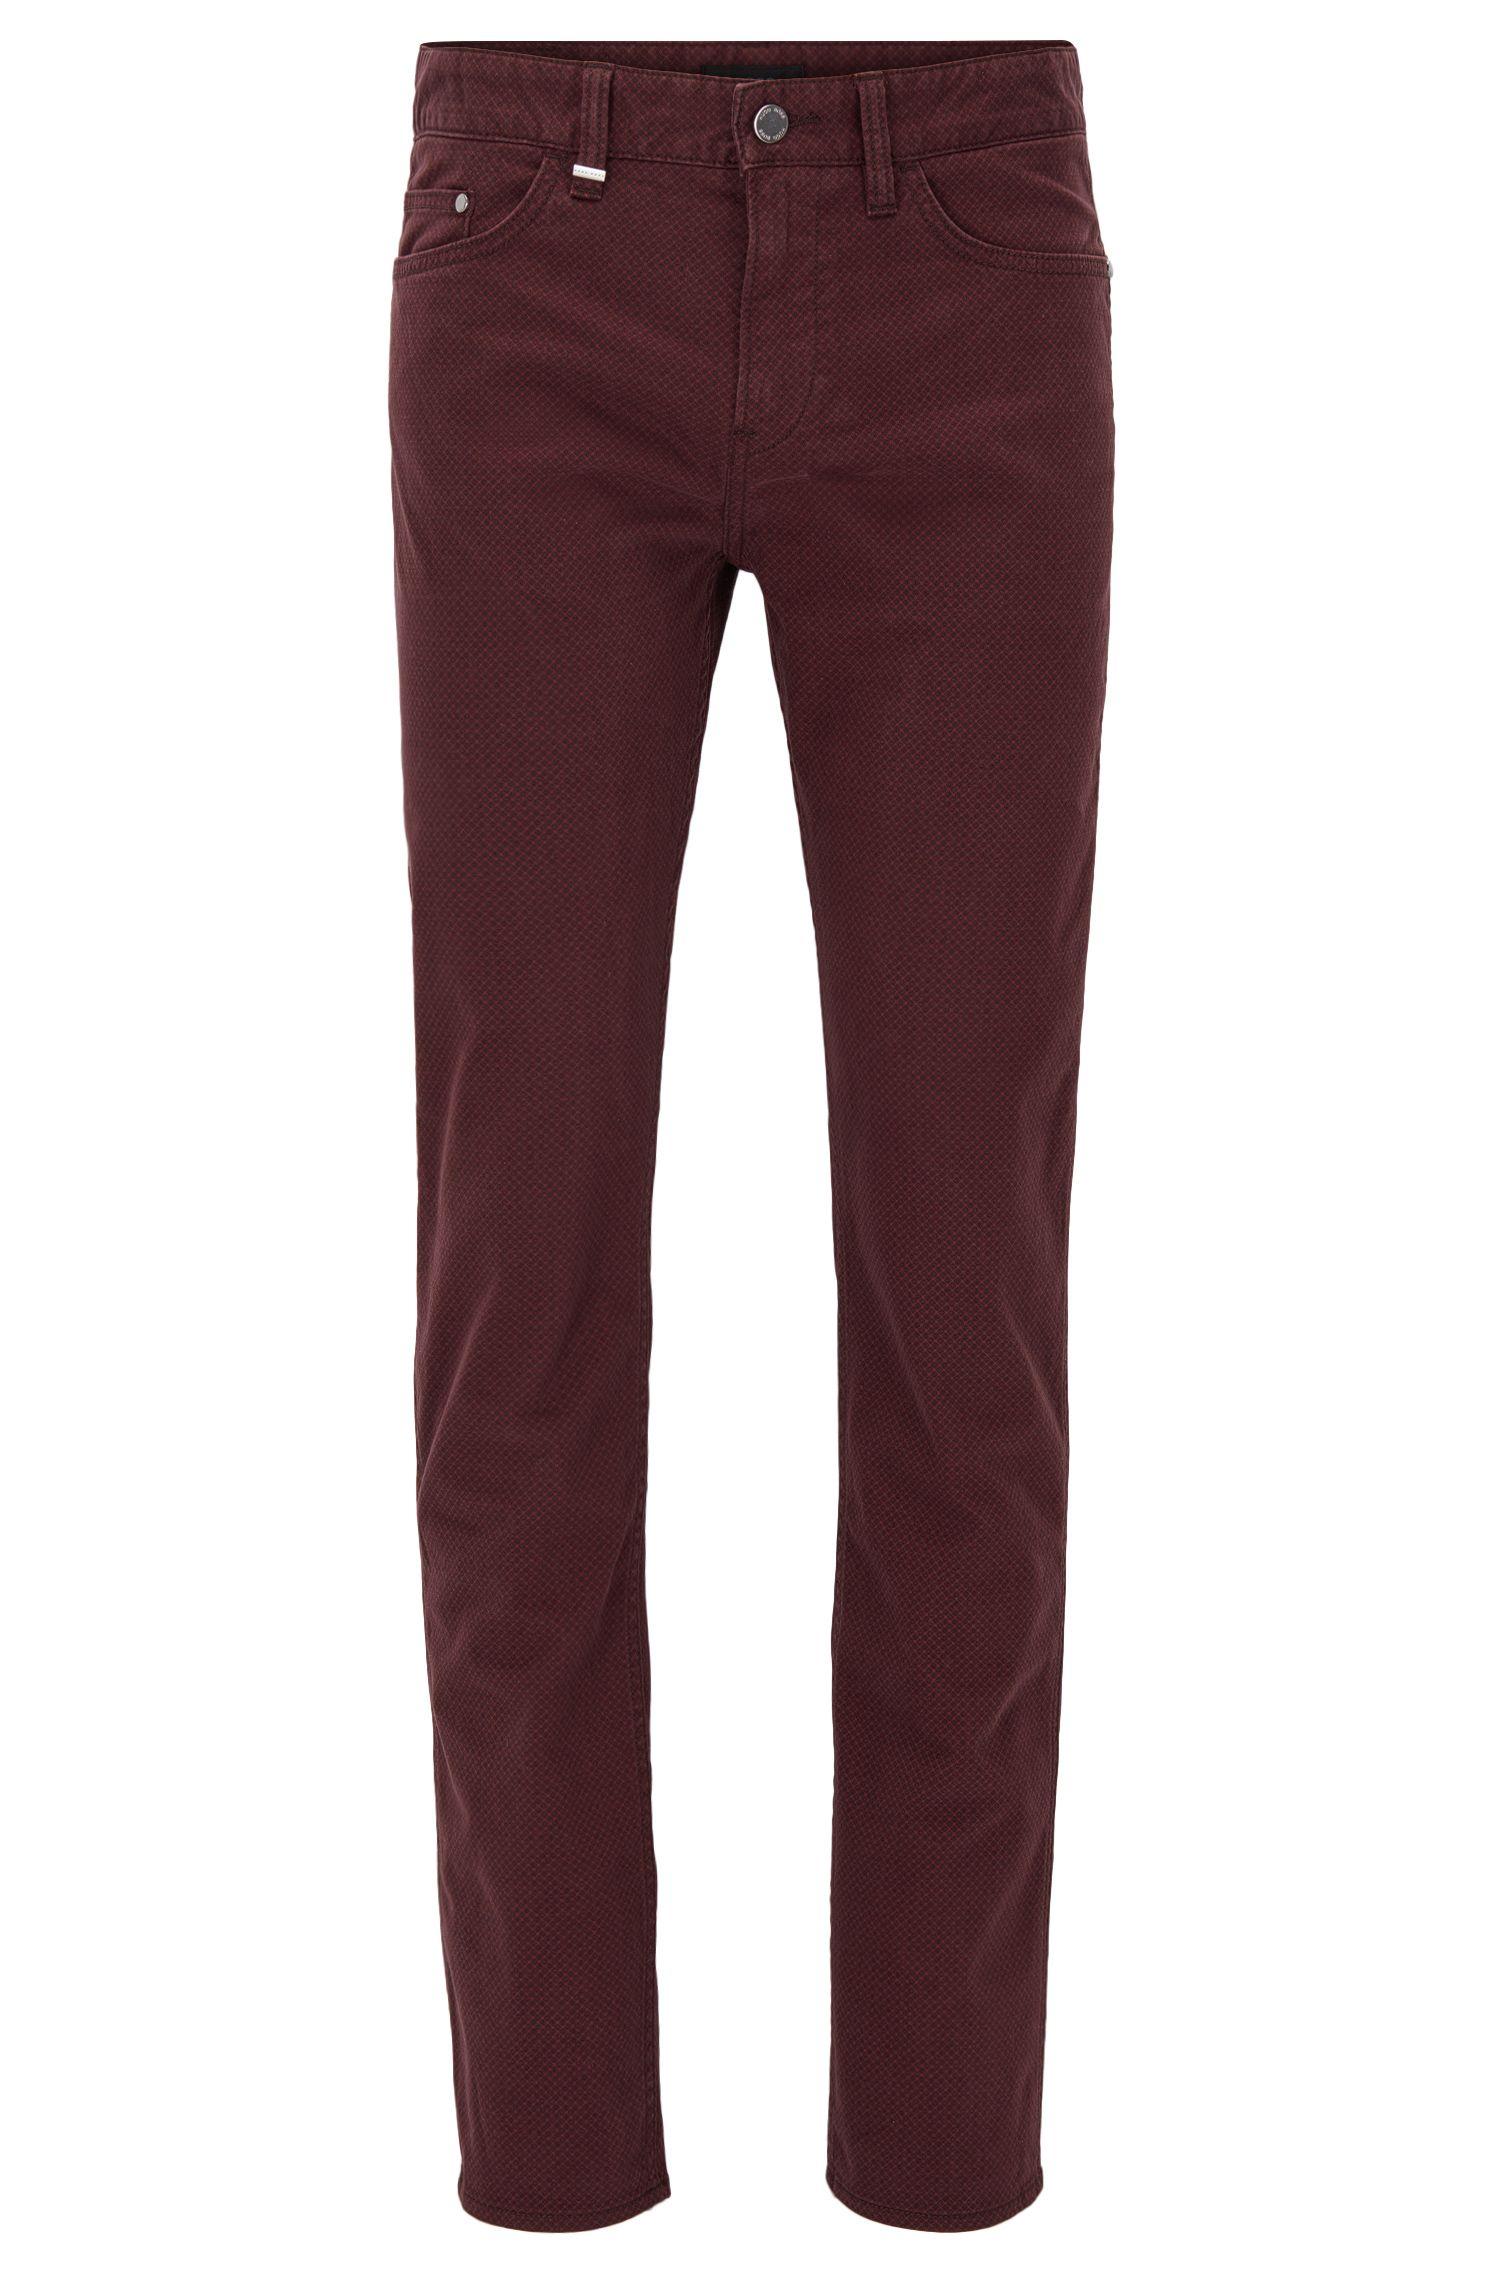 Micro-Print Stretch Cotton Jeans, Slim Fit | Delaware